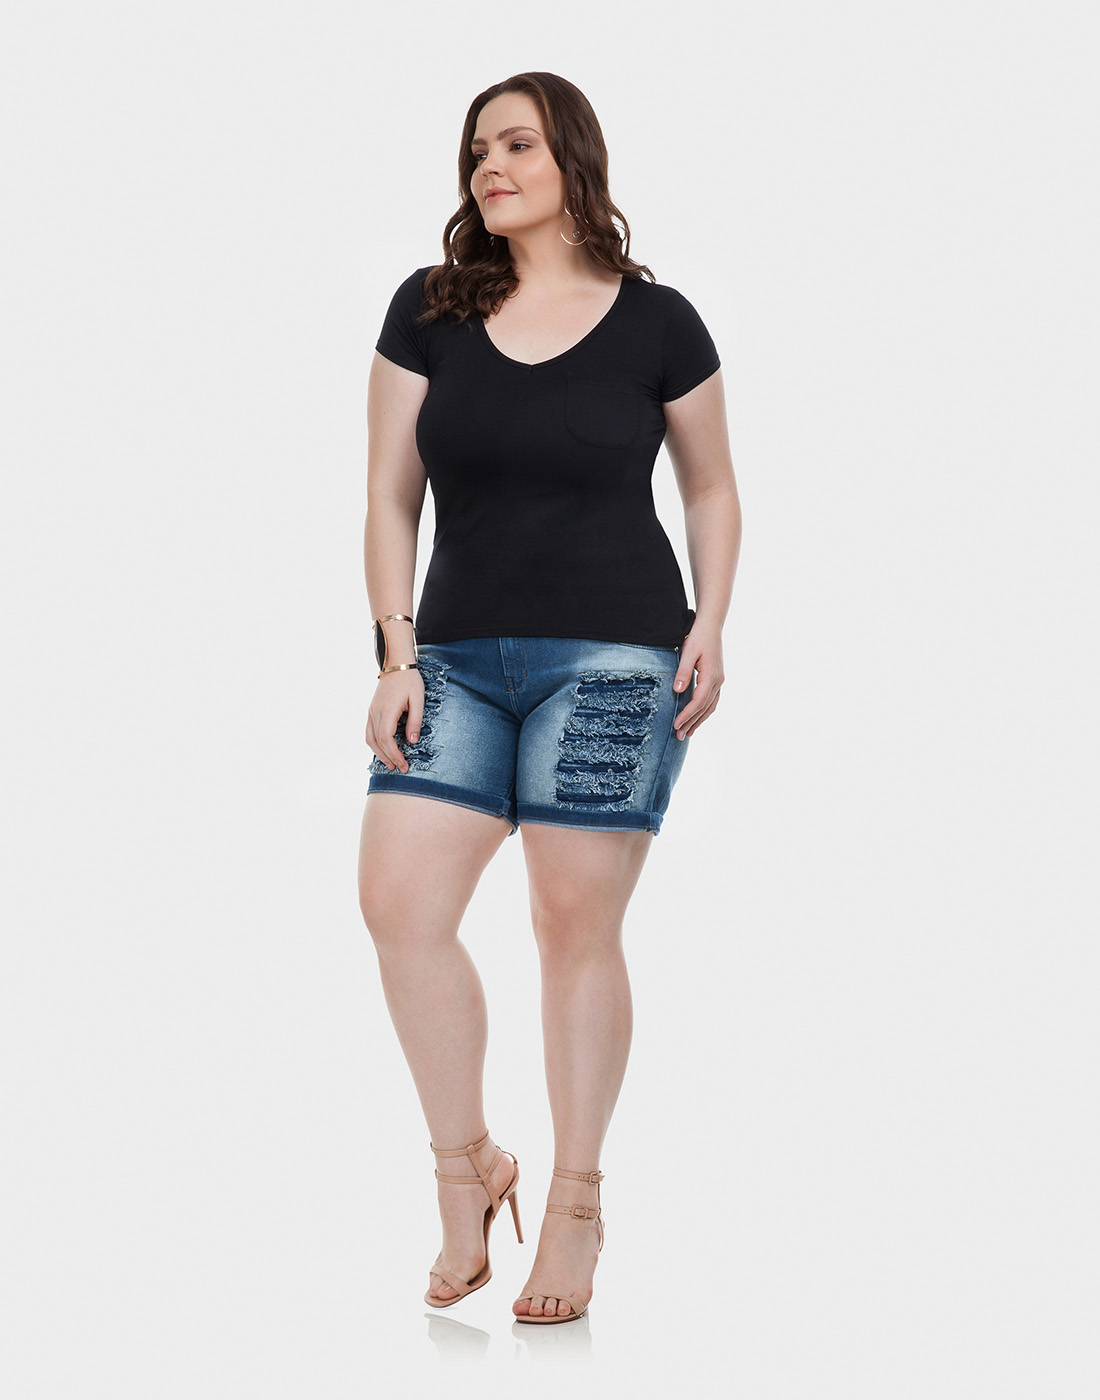 Blusa Básica Mullet com Bolso Plus Size Malha Viscose Lunender Mais Mulher